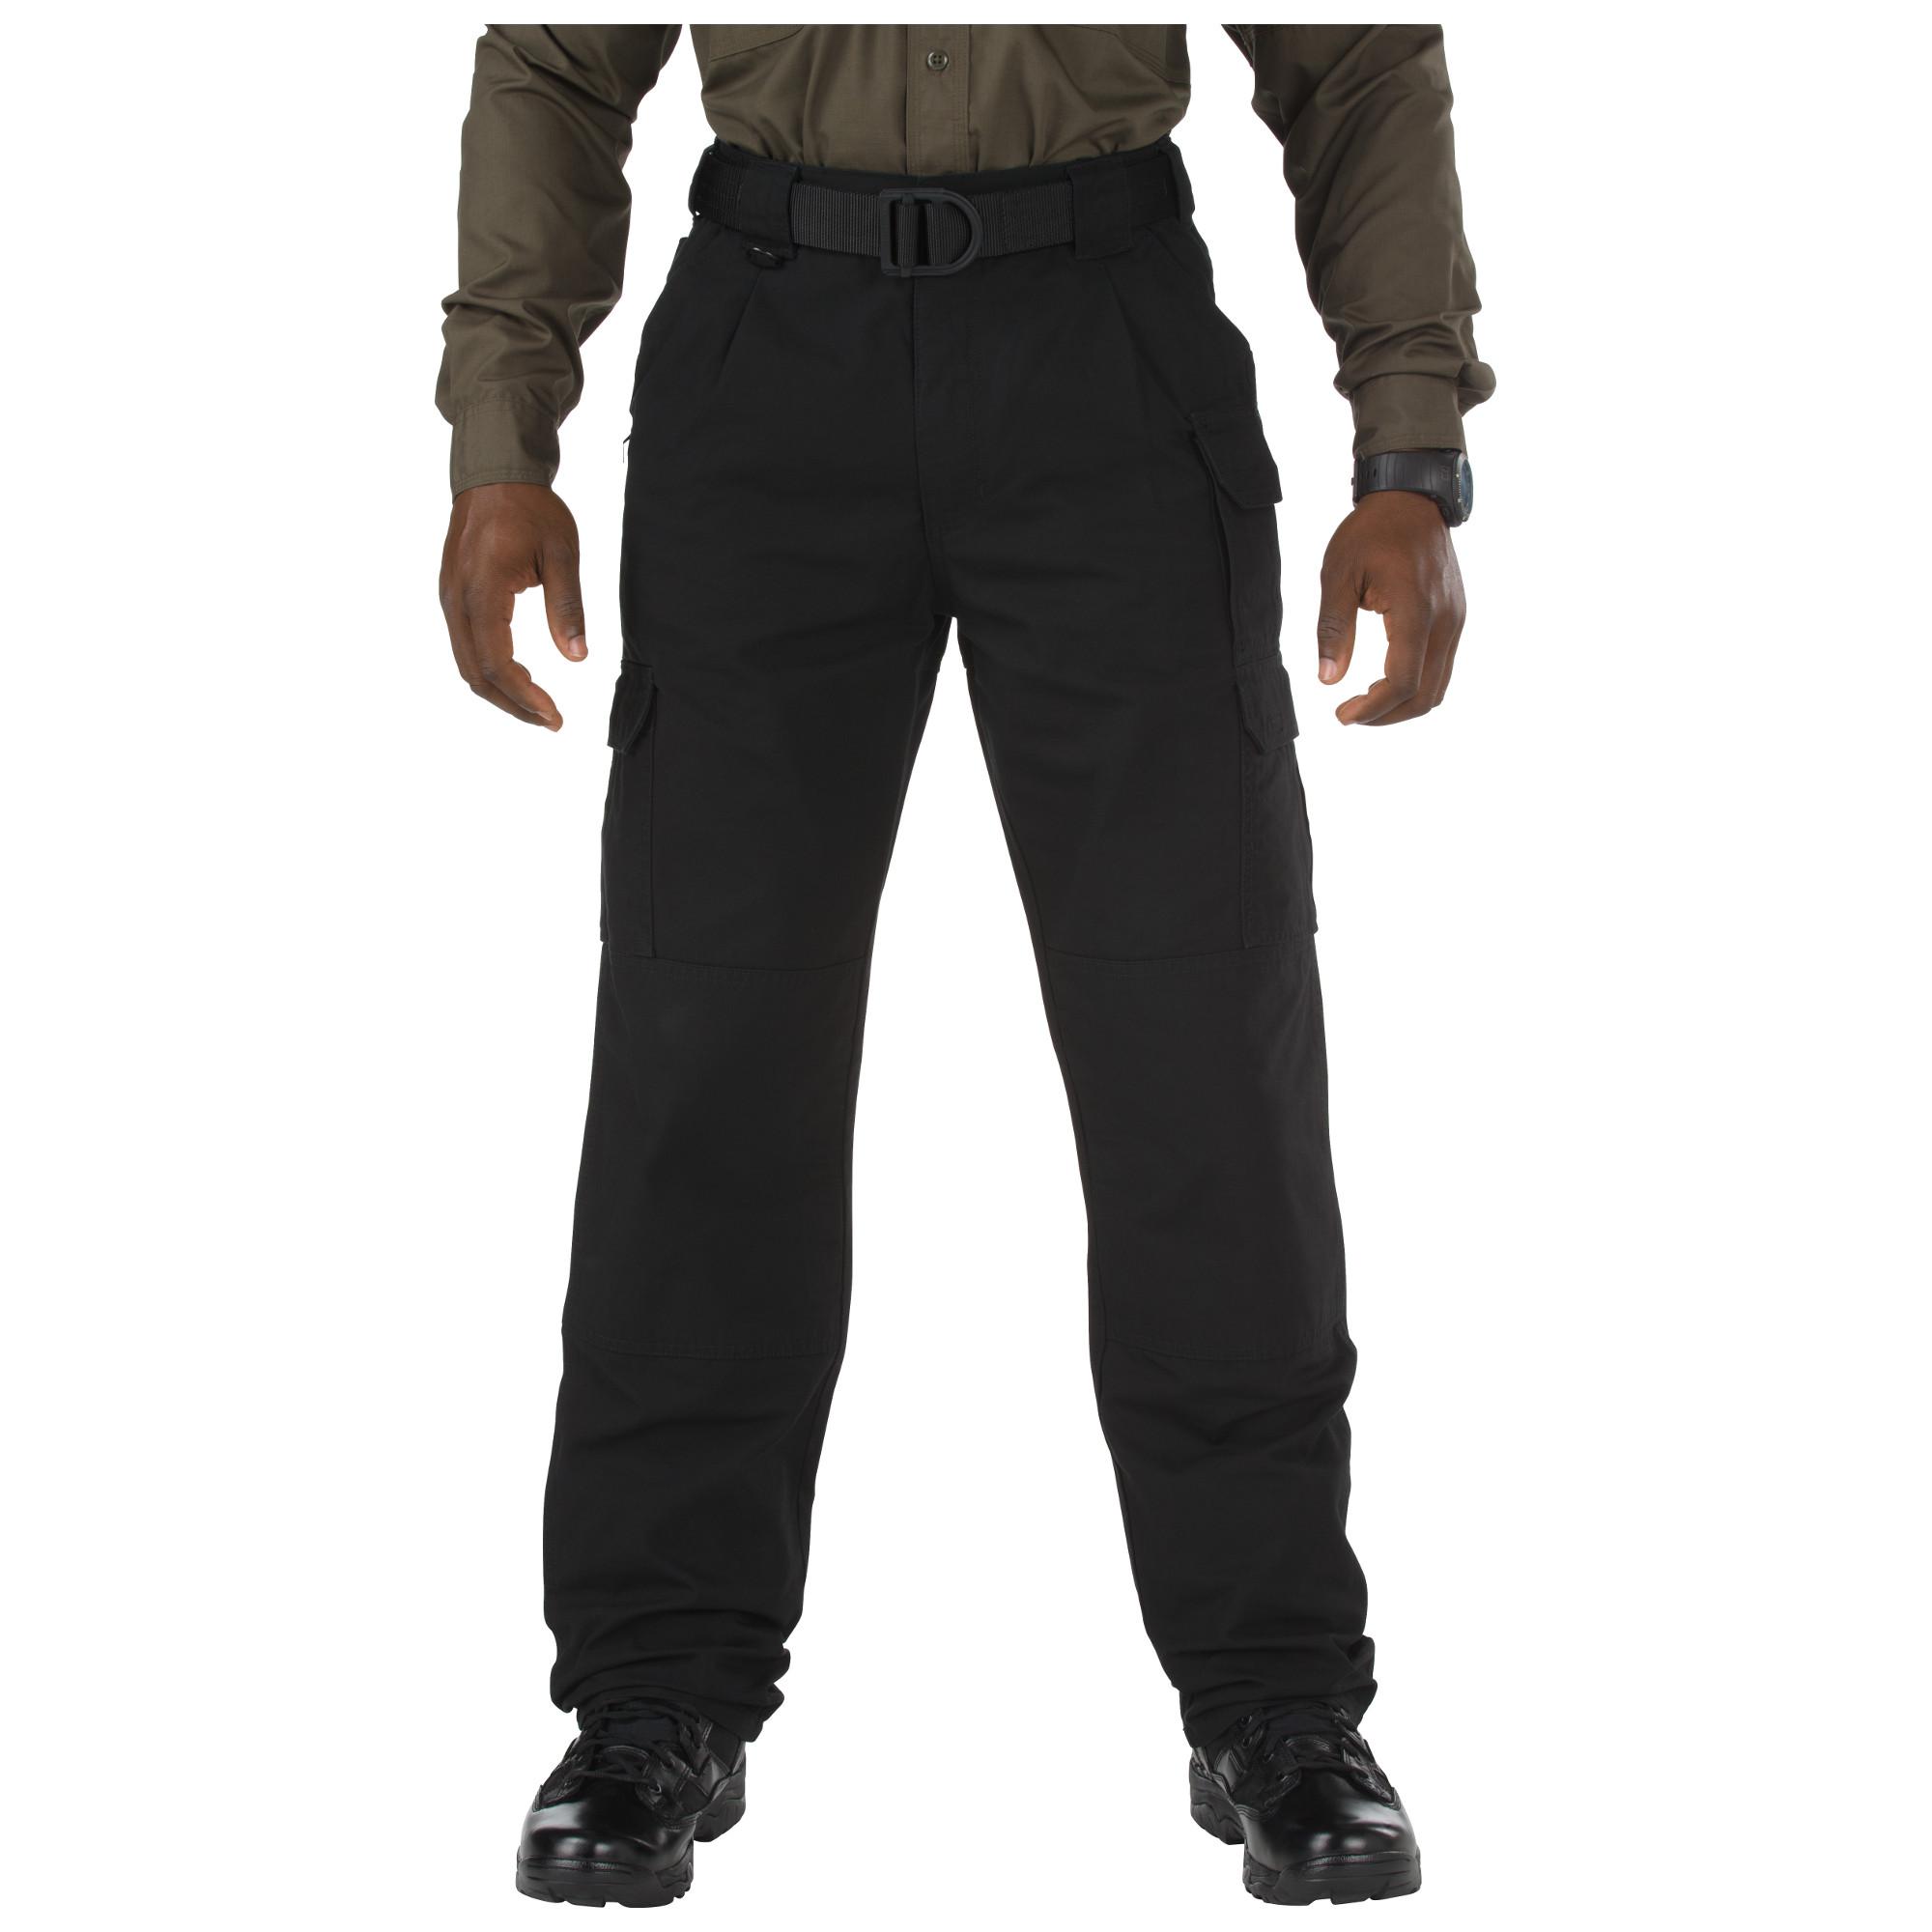 TACTICAL PANT TACTICAL PANT BLACK